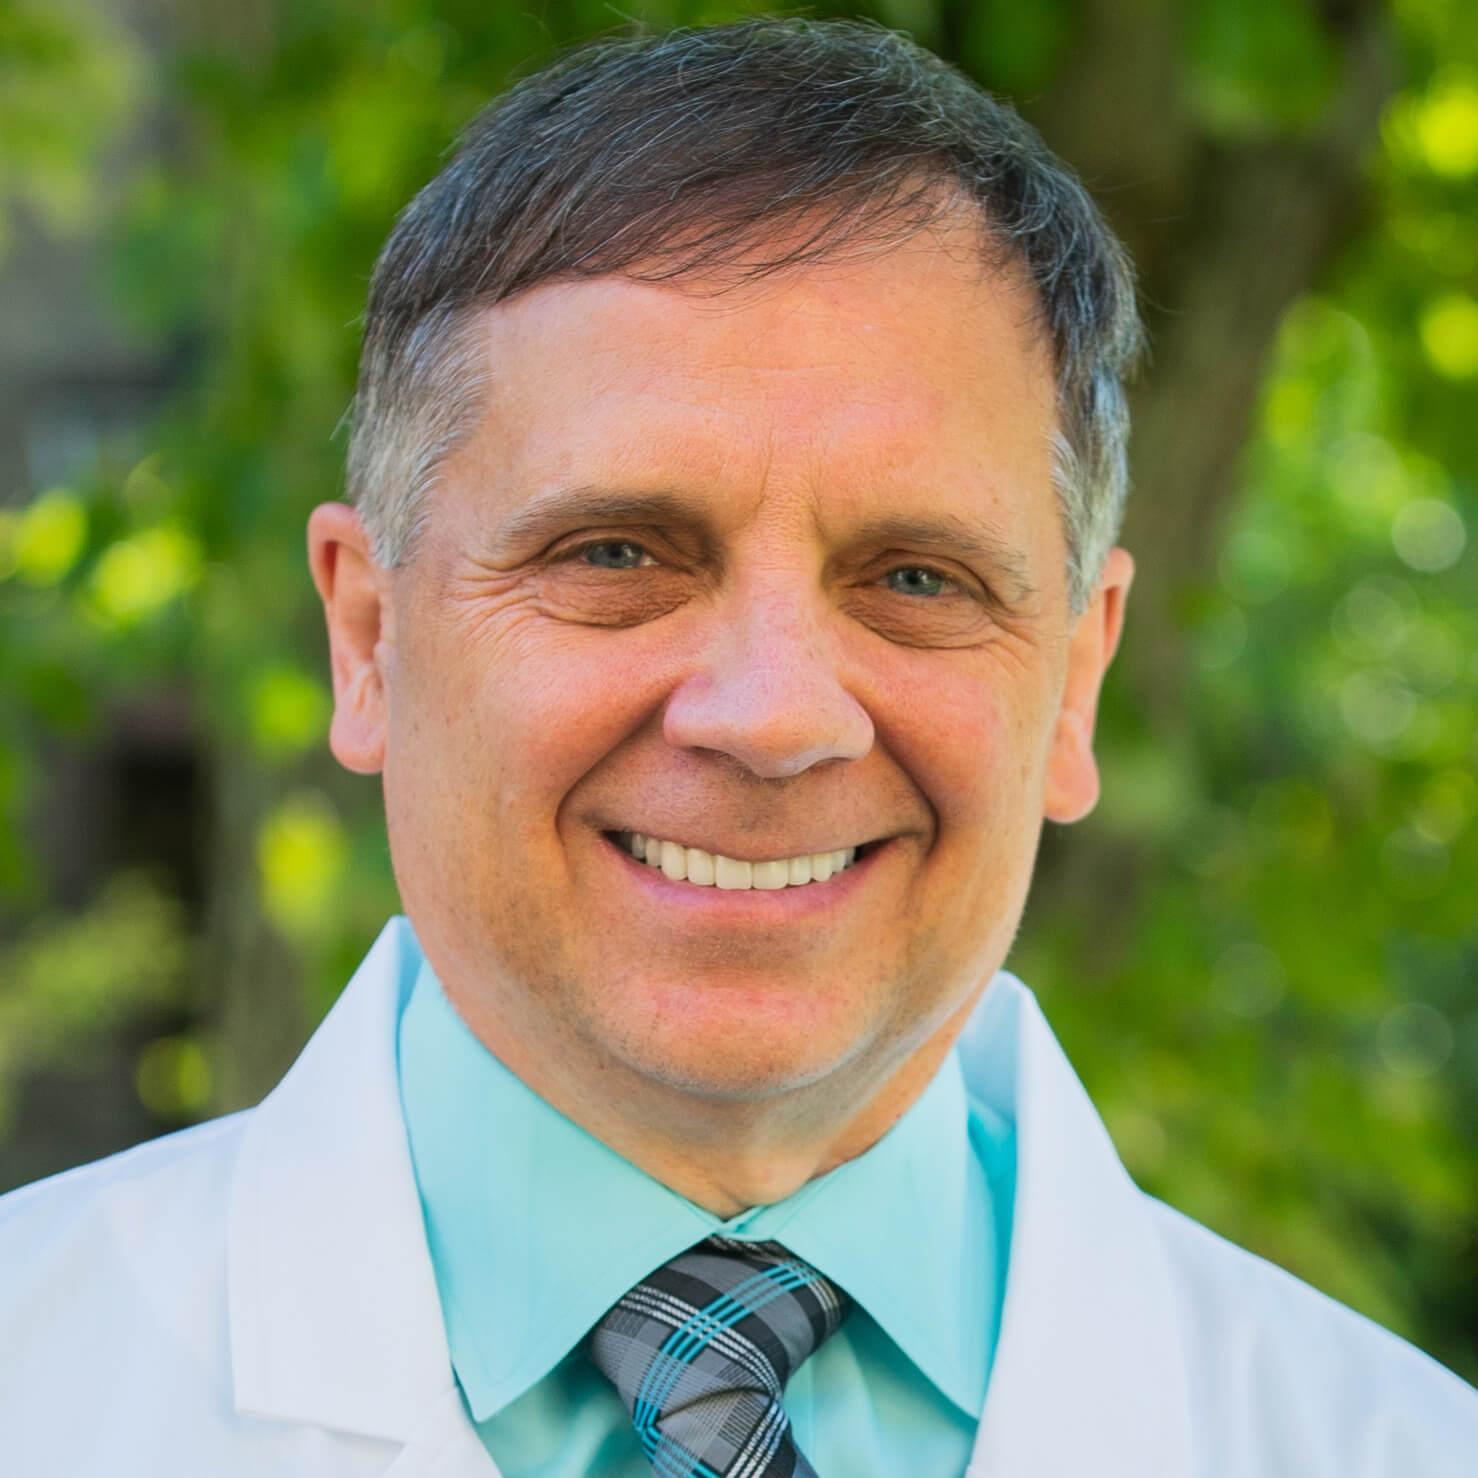 Dr. Matthew T. Scaffa